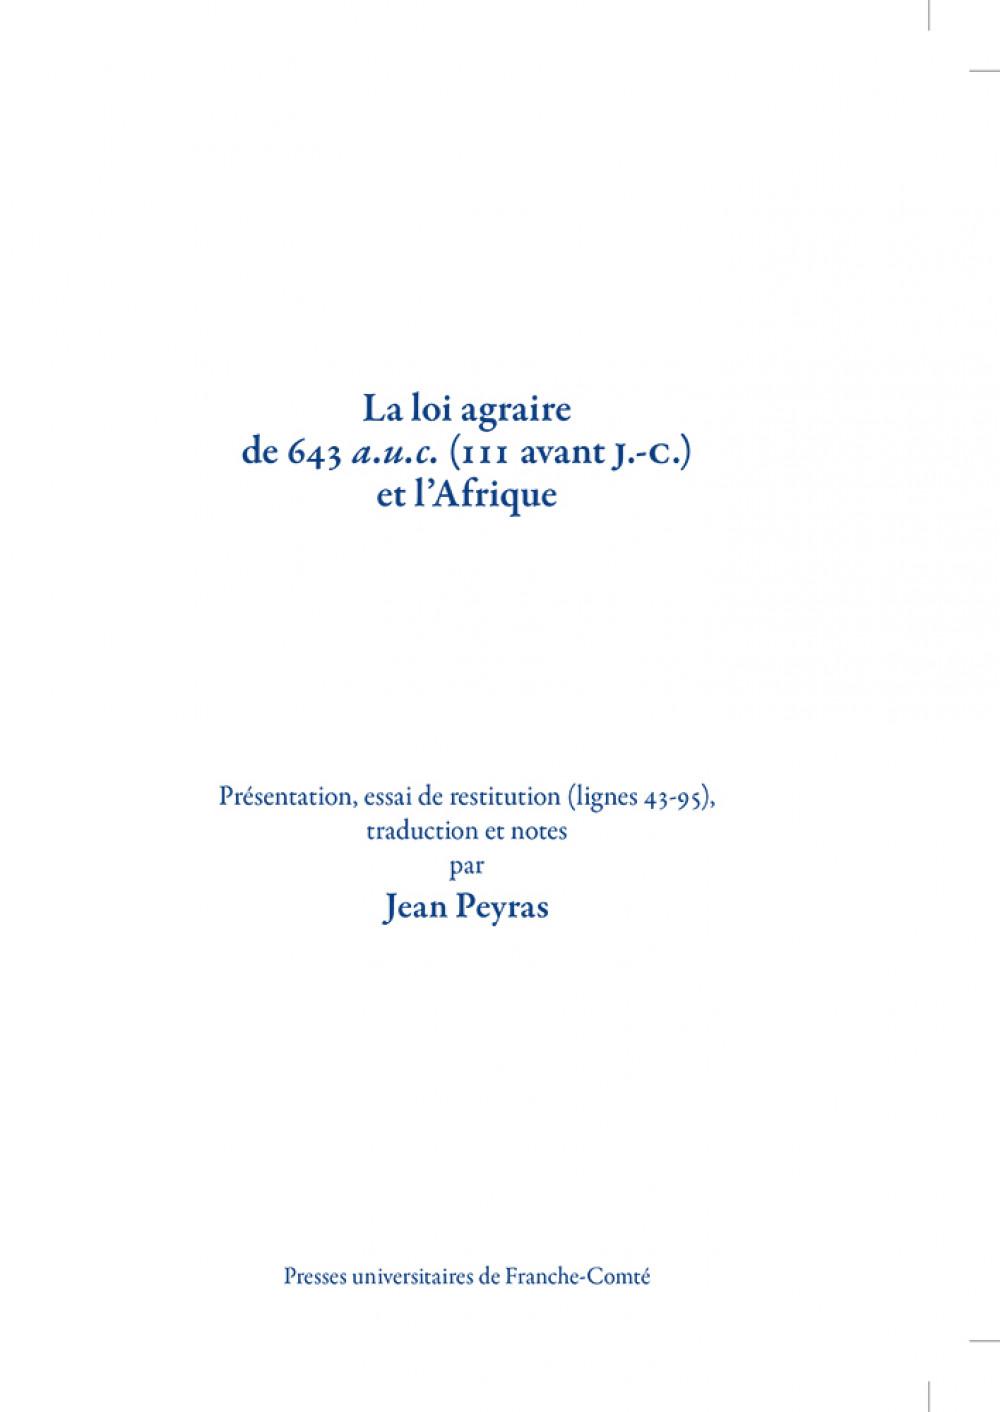 La loi agraire de 643 a.u.c. (111 avant J.-C.) et l'Afrique